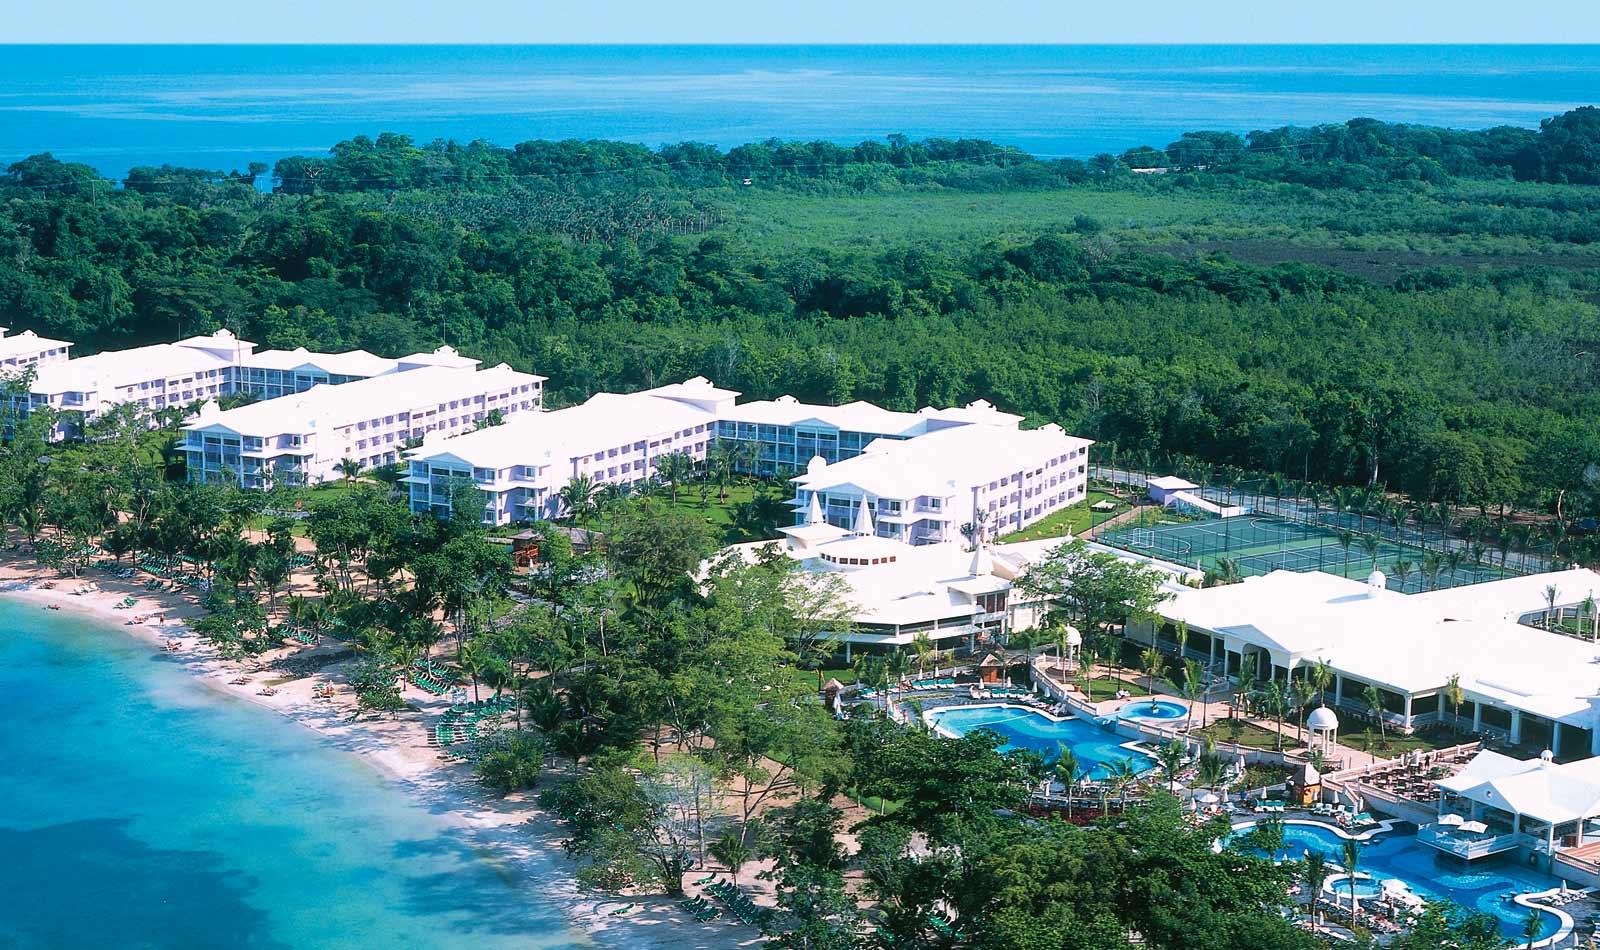 Club Hotel Riu Ocho Rios Jamaique